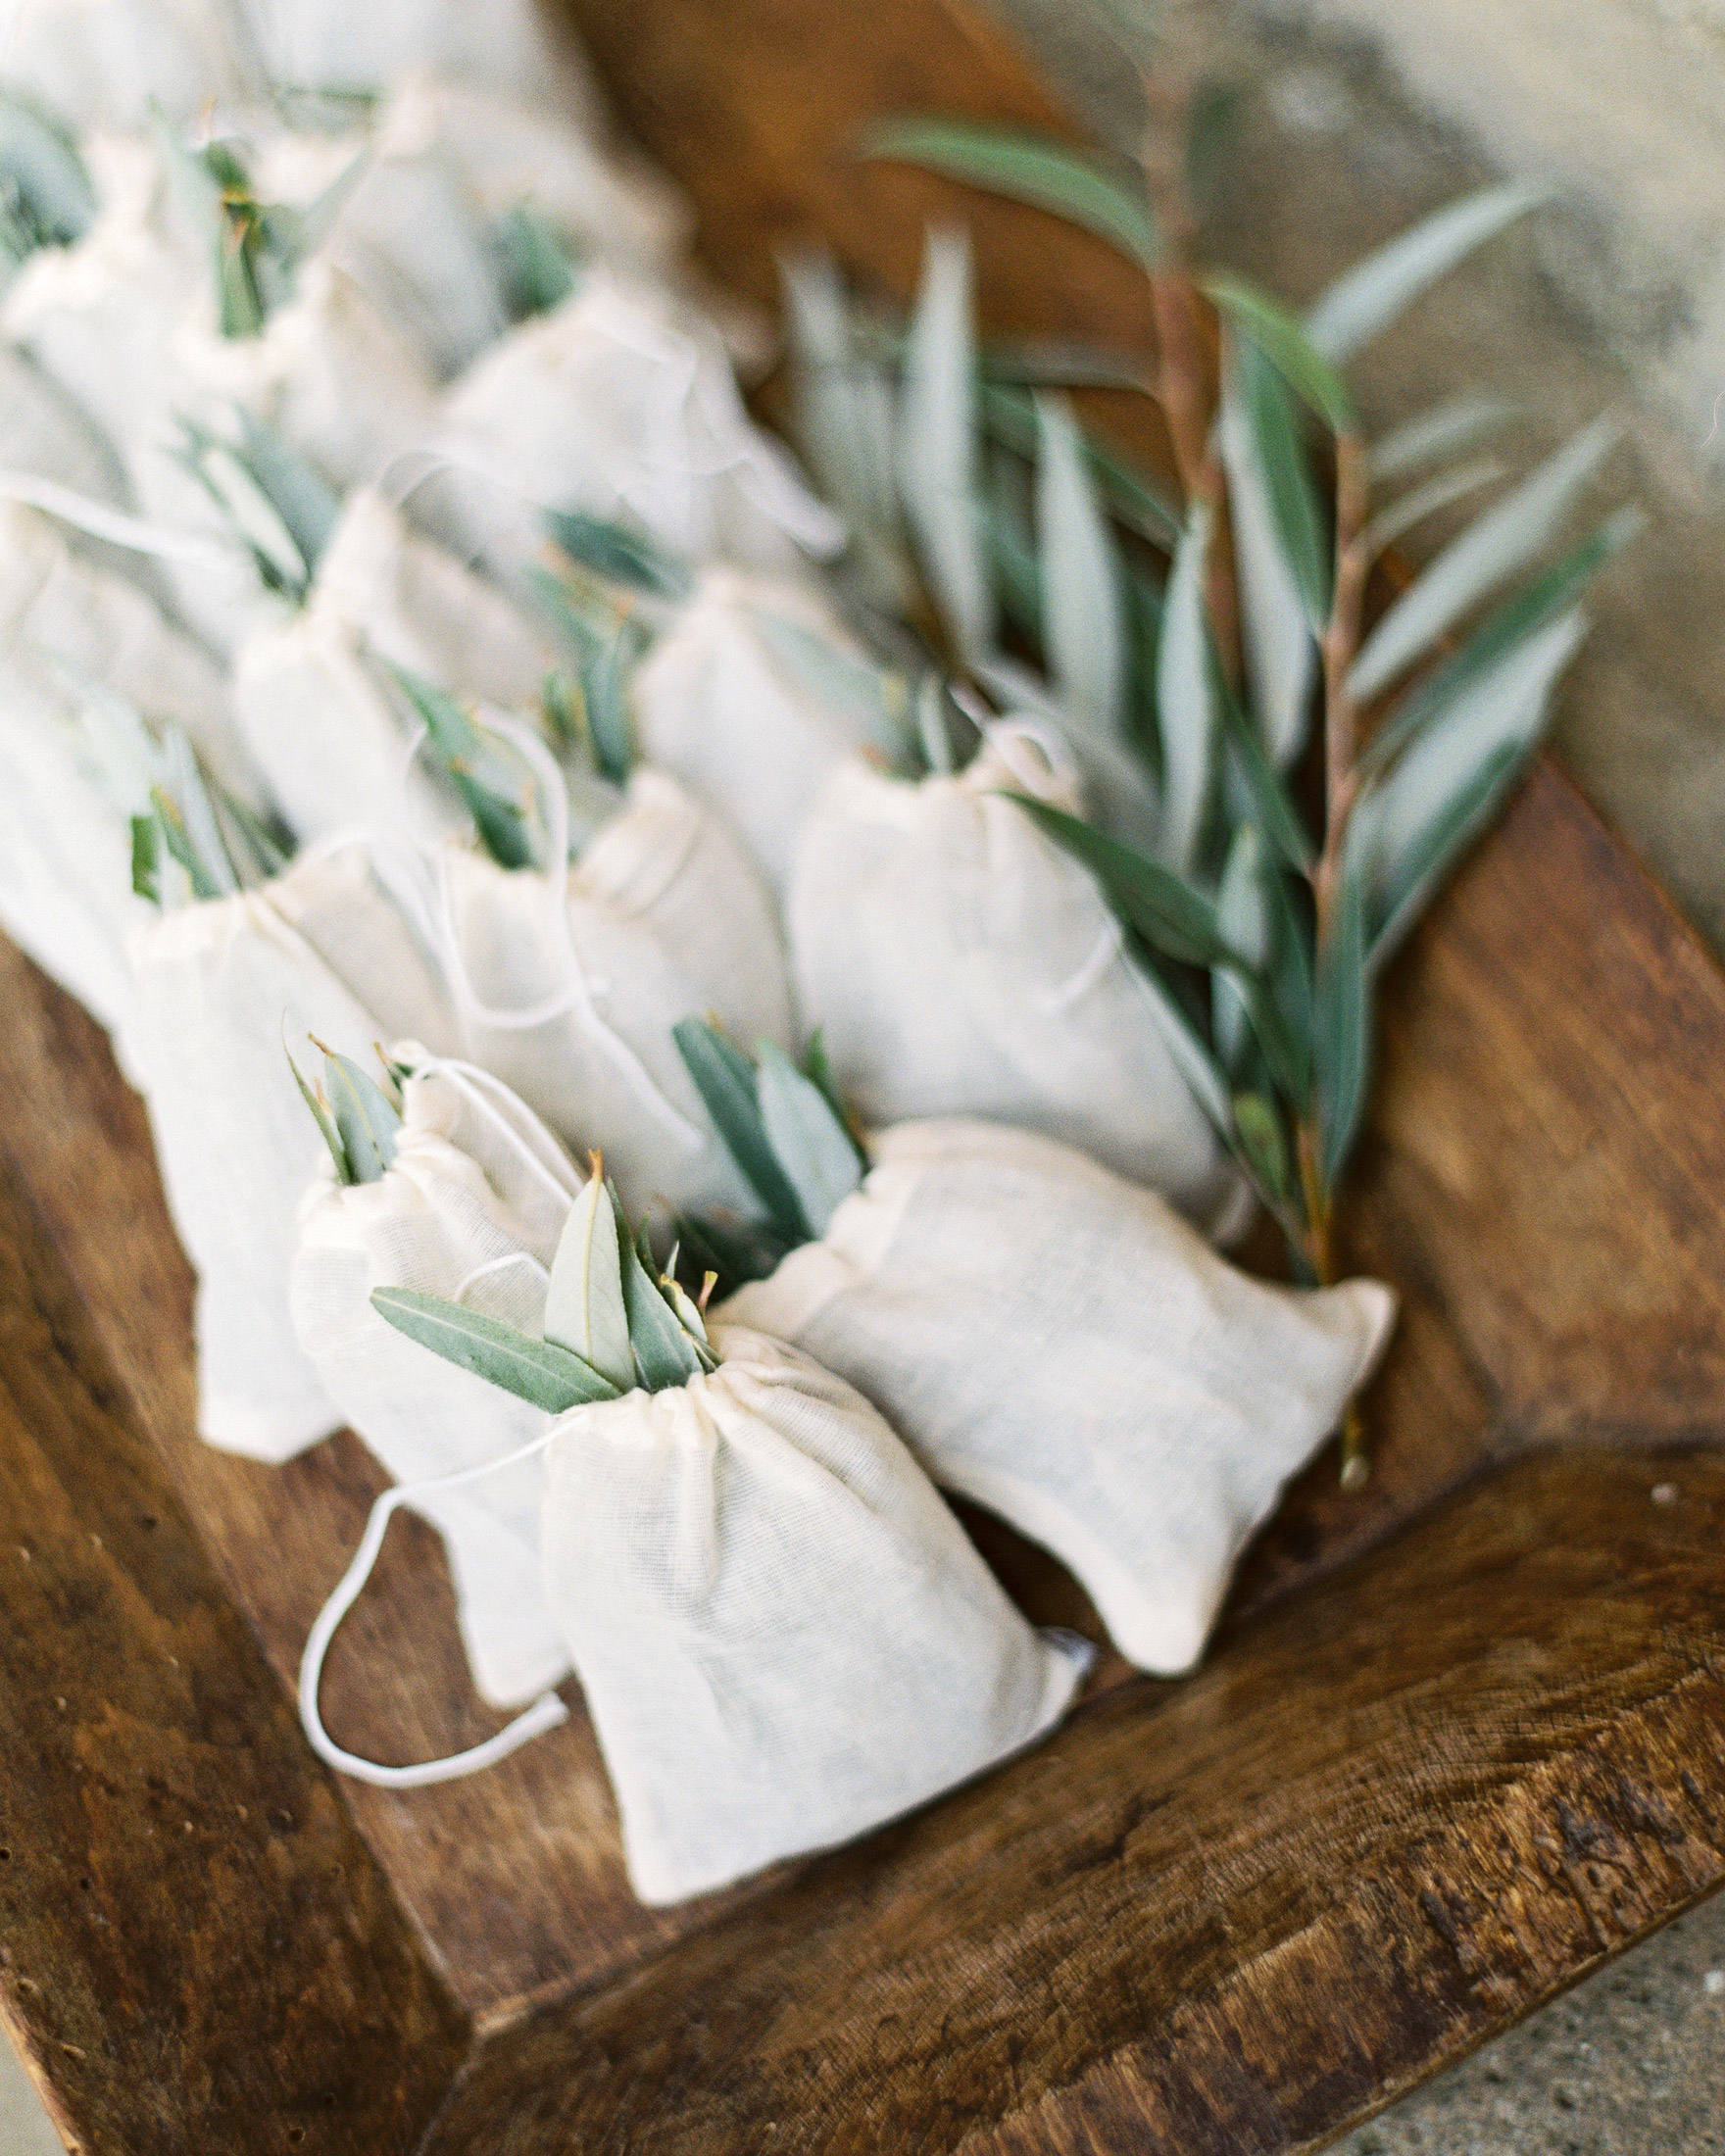 christine-dagan-wedding-toss-olive-leaves-4282_14-s113011-0616.jpg